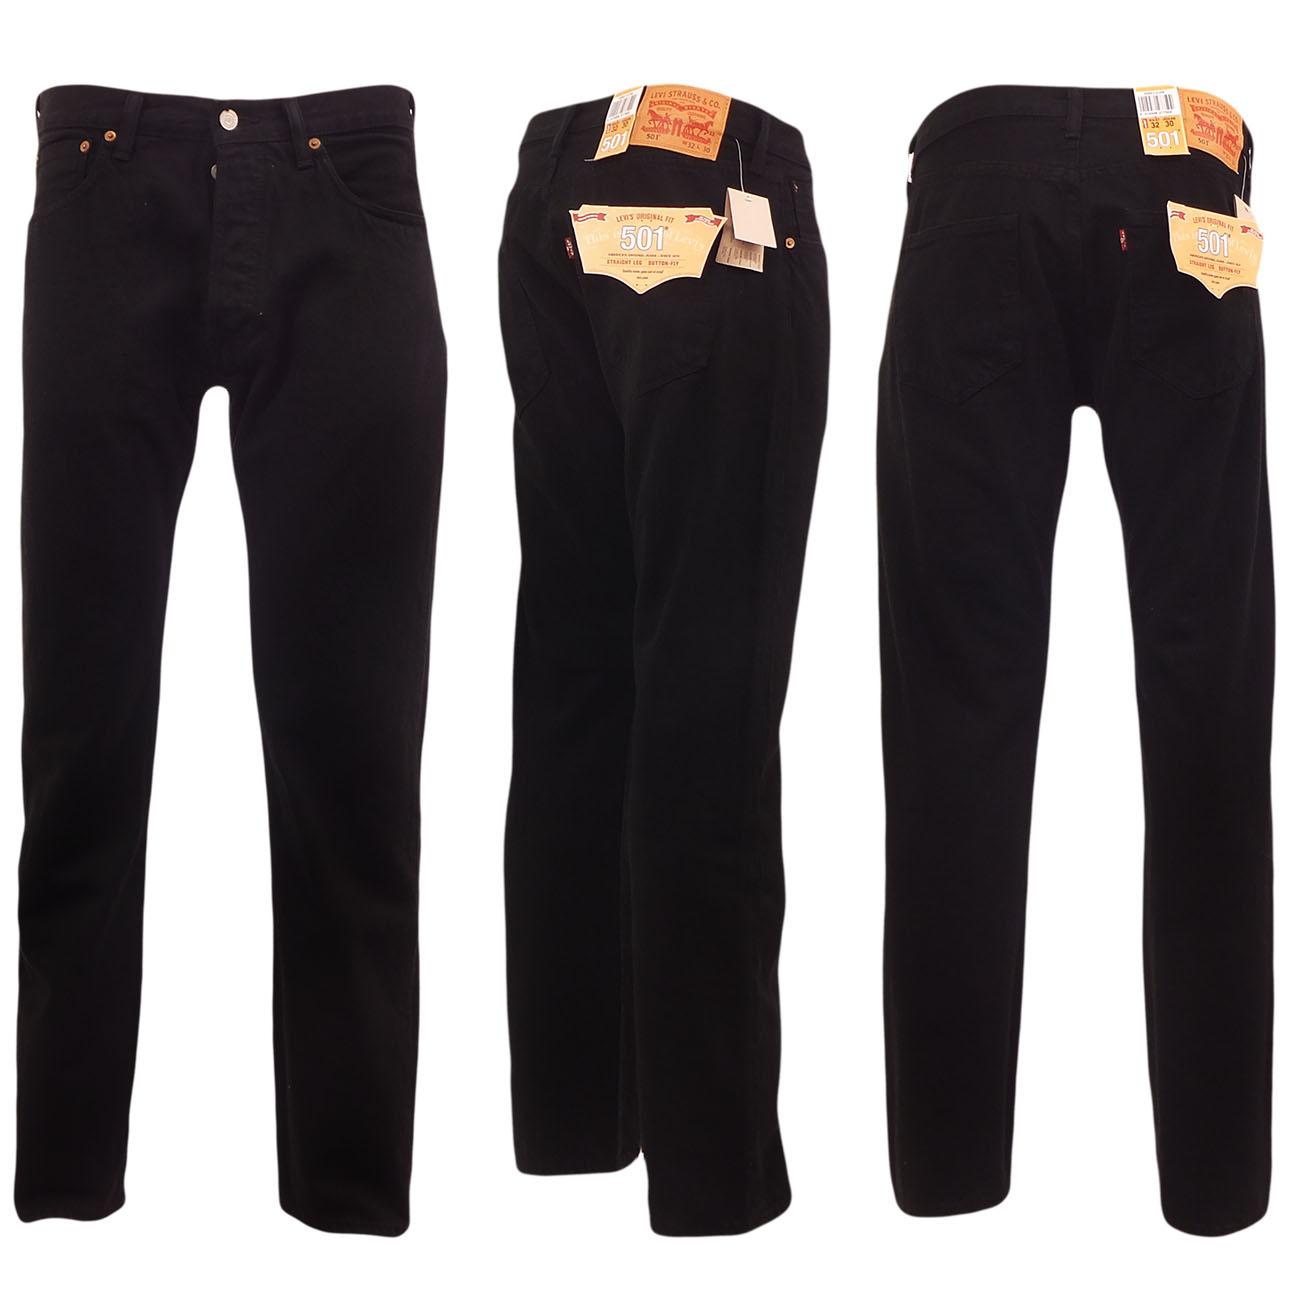 Levi-501-Jeans-Para-Hombre-Original-Levi-039-s-Strauss-Denim-Straight-Fit-Nuevo-Todos-Los-Tamanos